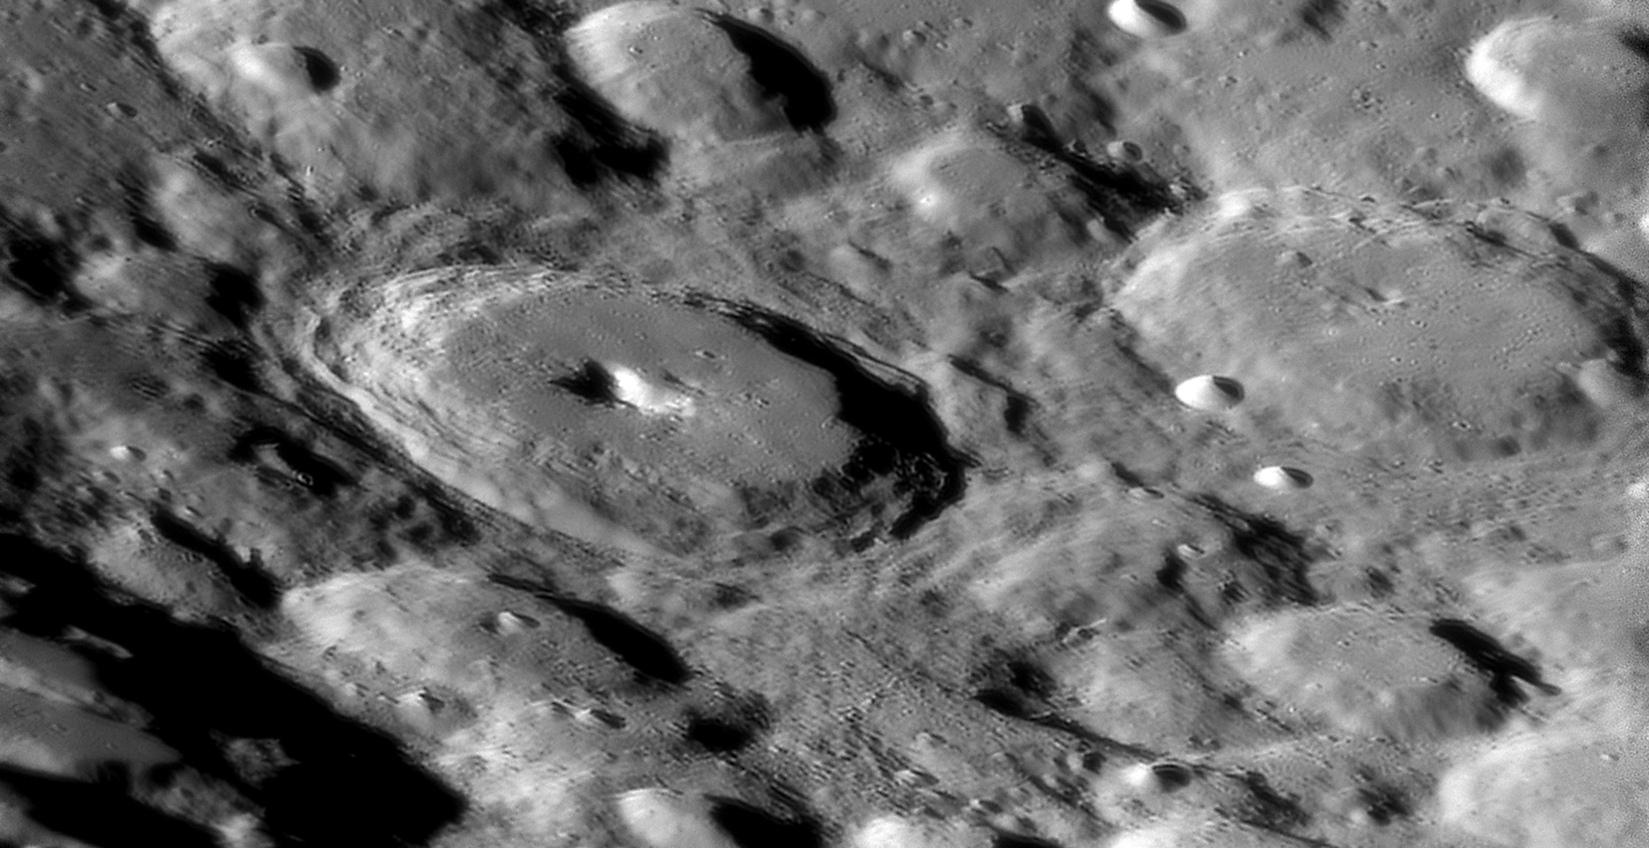 large.moon_CAS_03_04_2020_MORETUS.jpg.e826d8f5ad8b73081723d4a73bab4a7c.jpg